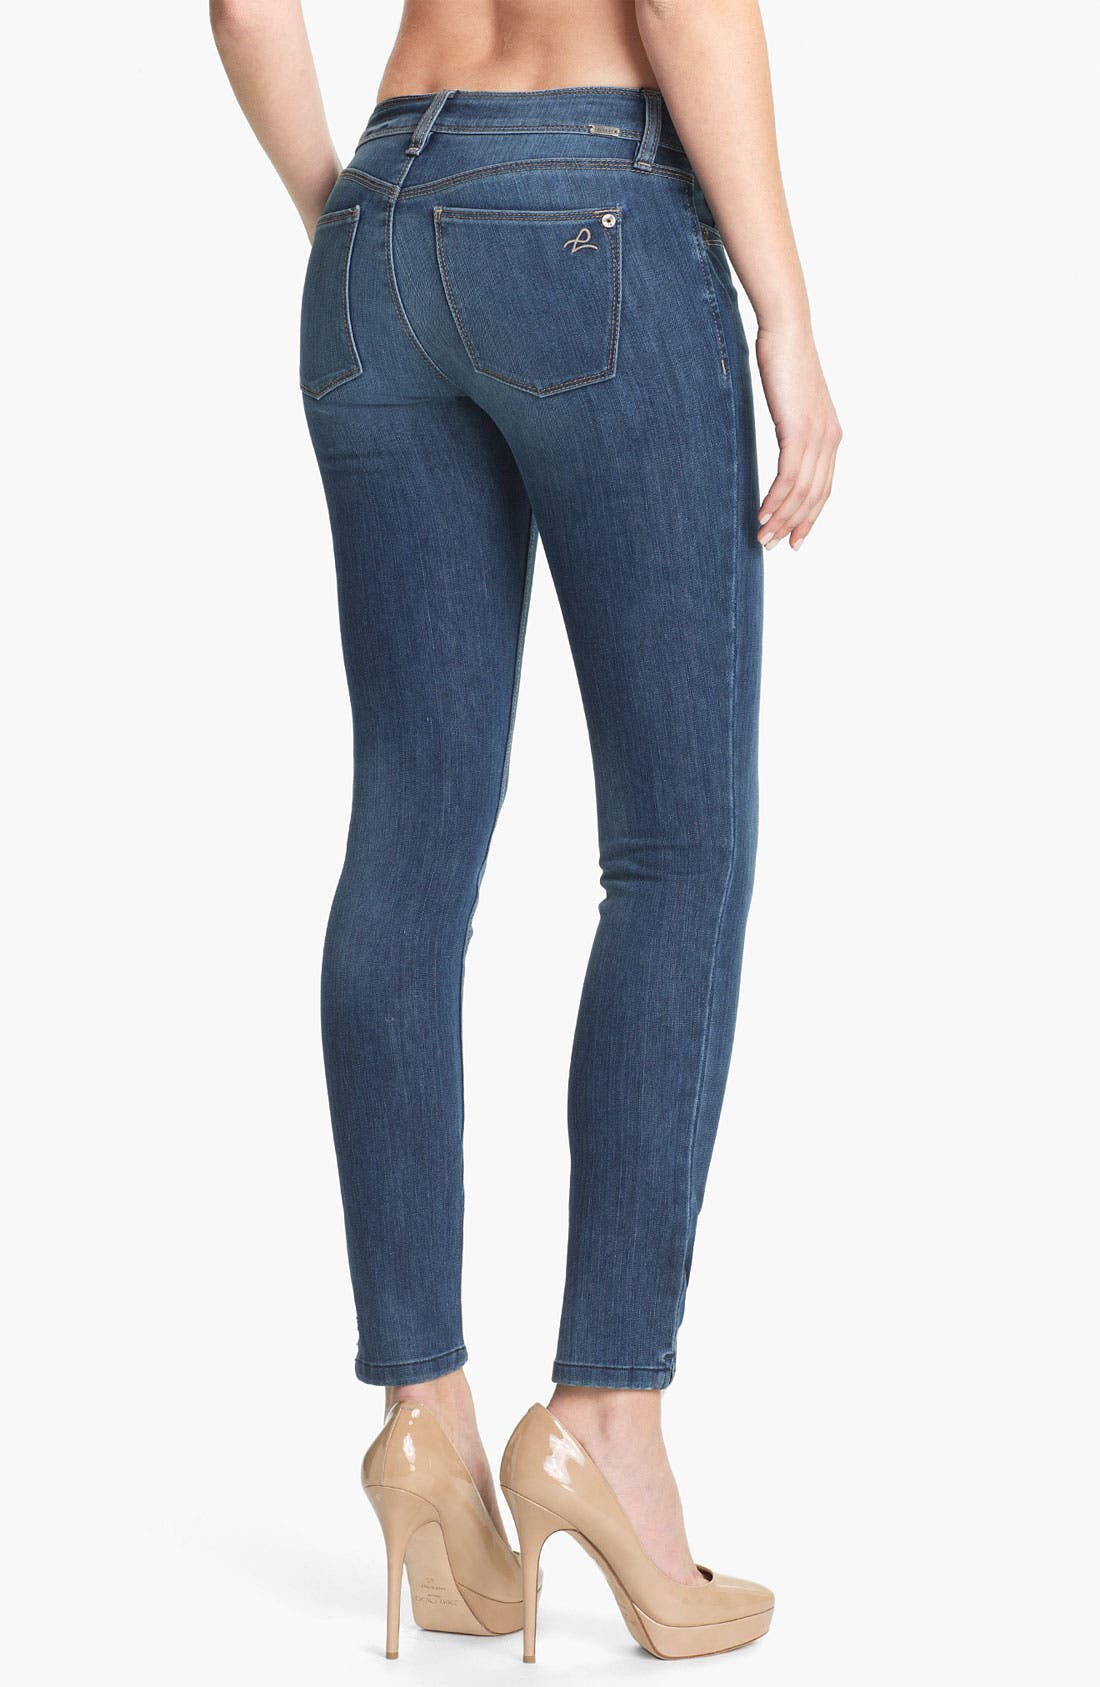 Alternate Image 2  - DL1961 'Angel' X-Fit Stretch Denim Skinny Ankle Jeans (Zeppelin)